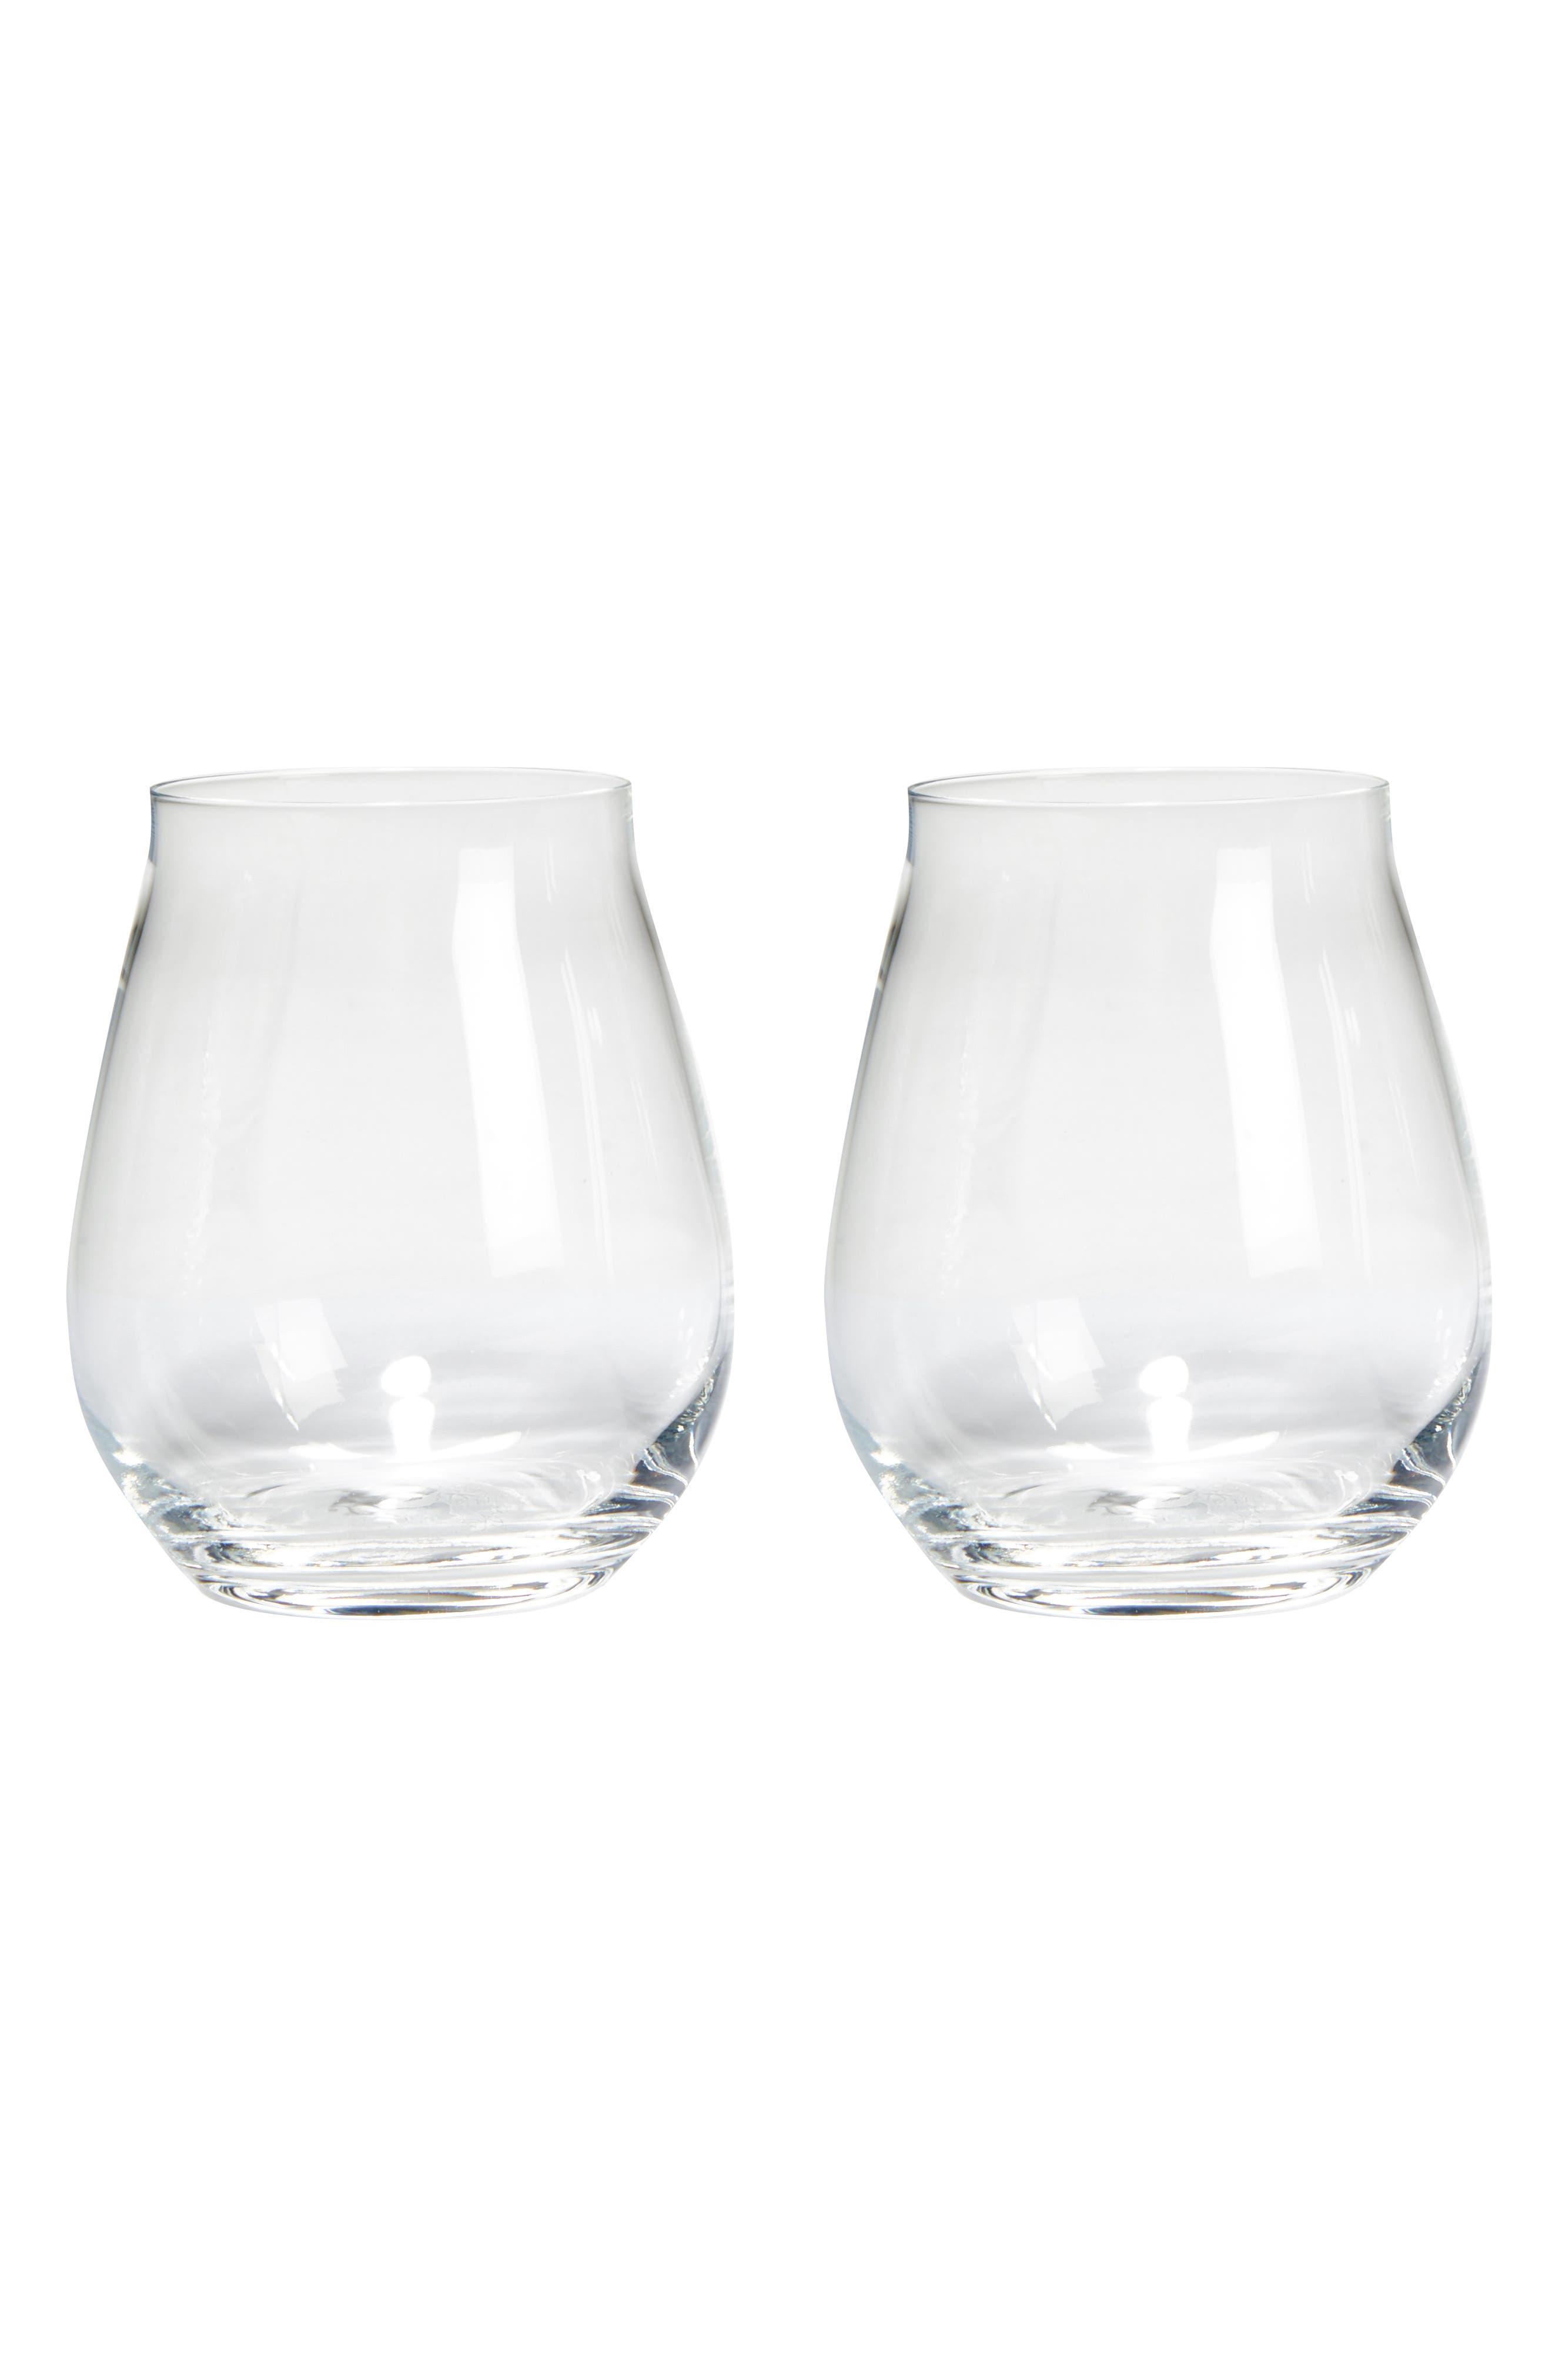 Luigi Bormiolo Vinea Trebbiano Set of 2 Stemless Wine Glasses,                             Main thumbnail 1, color,                             Clear